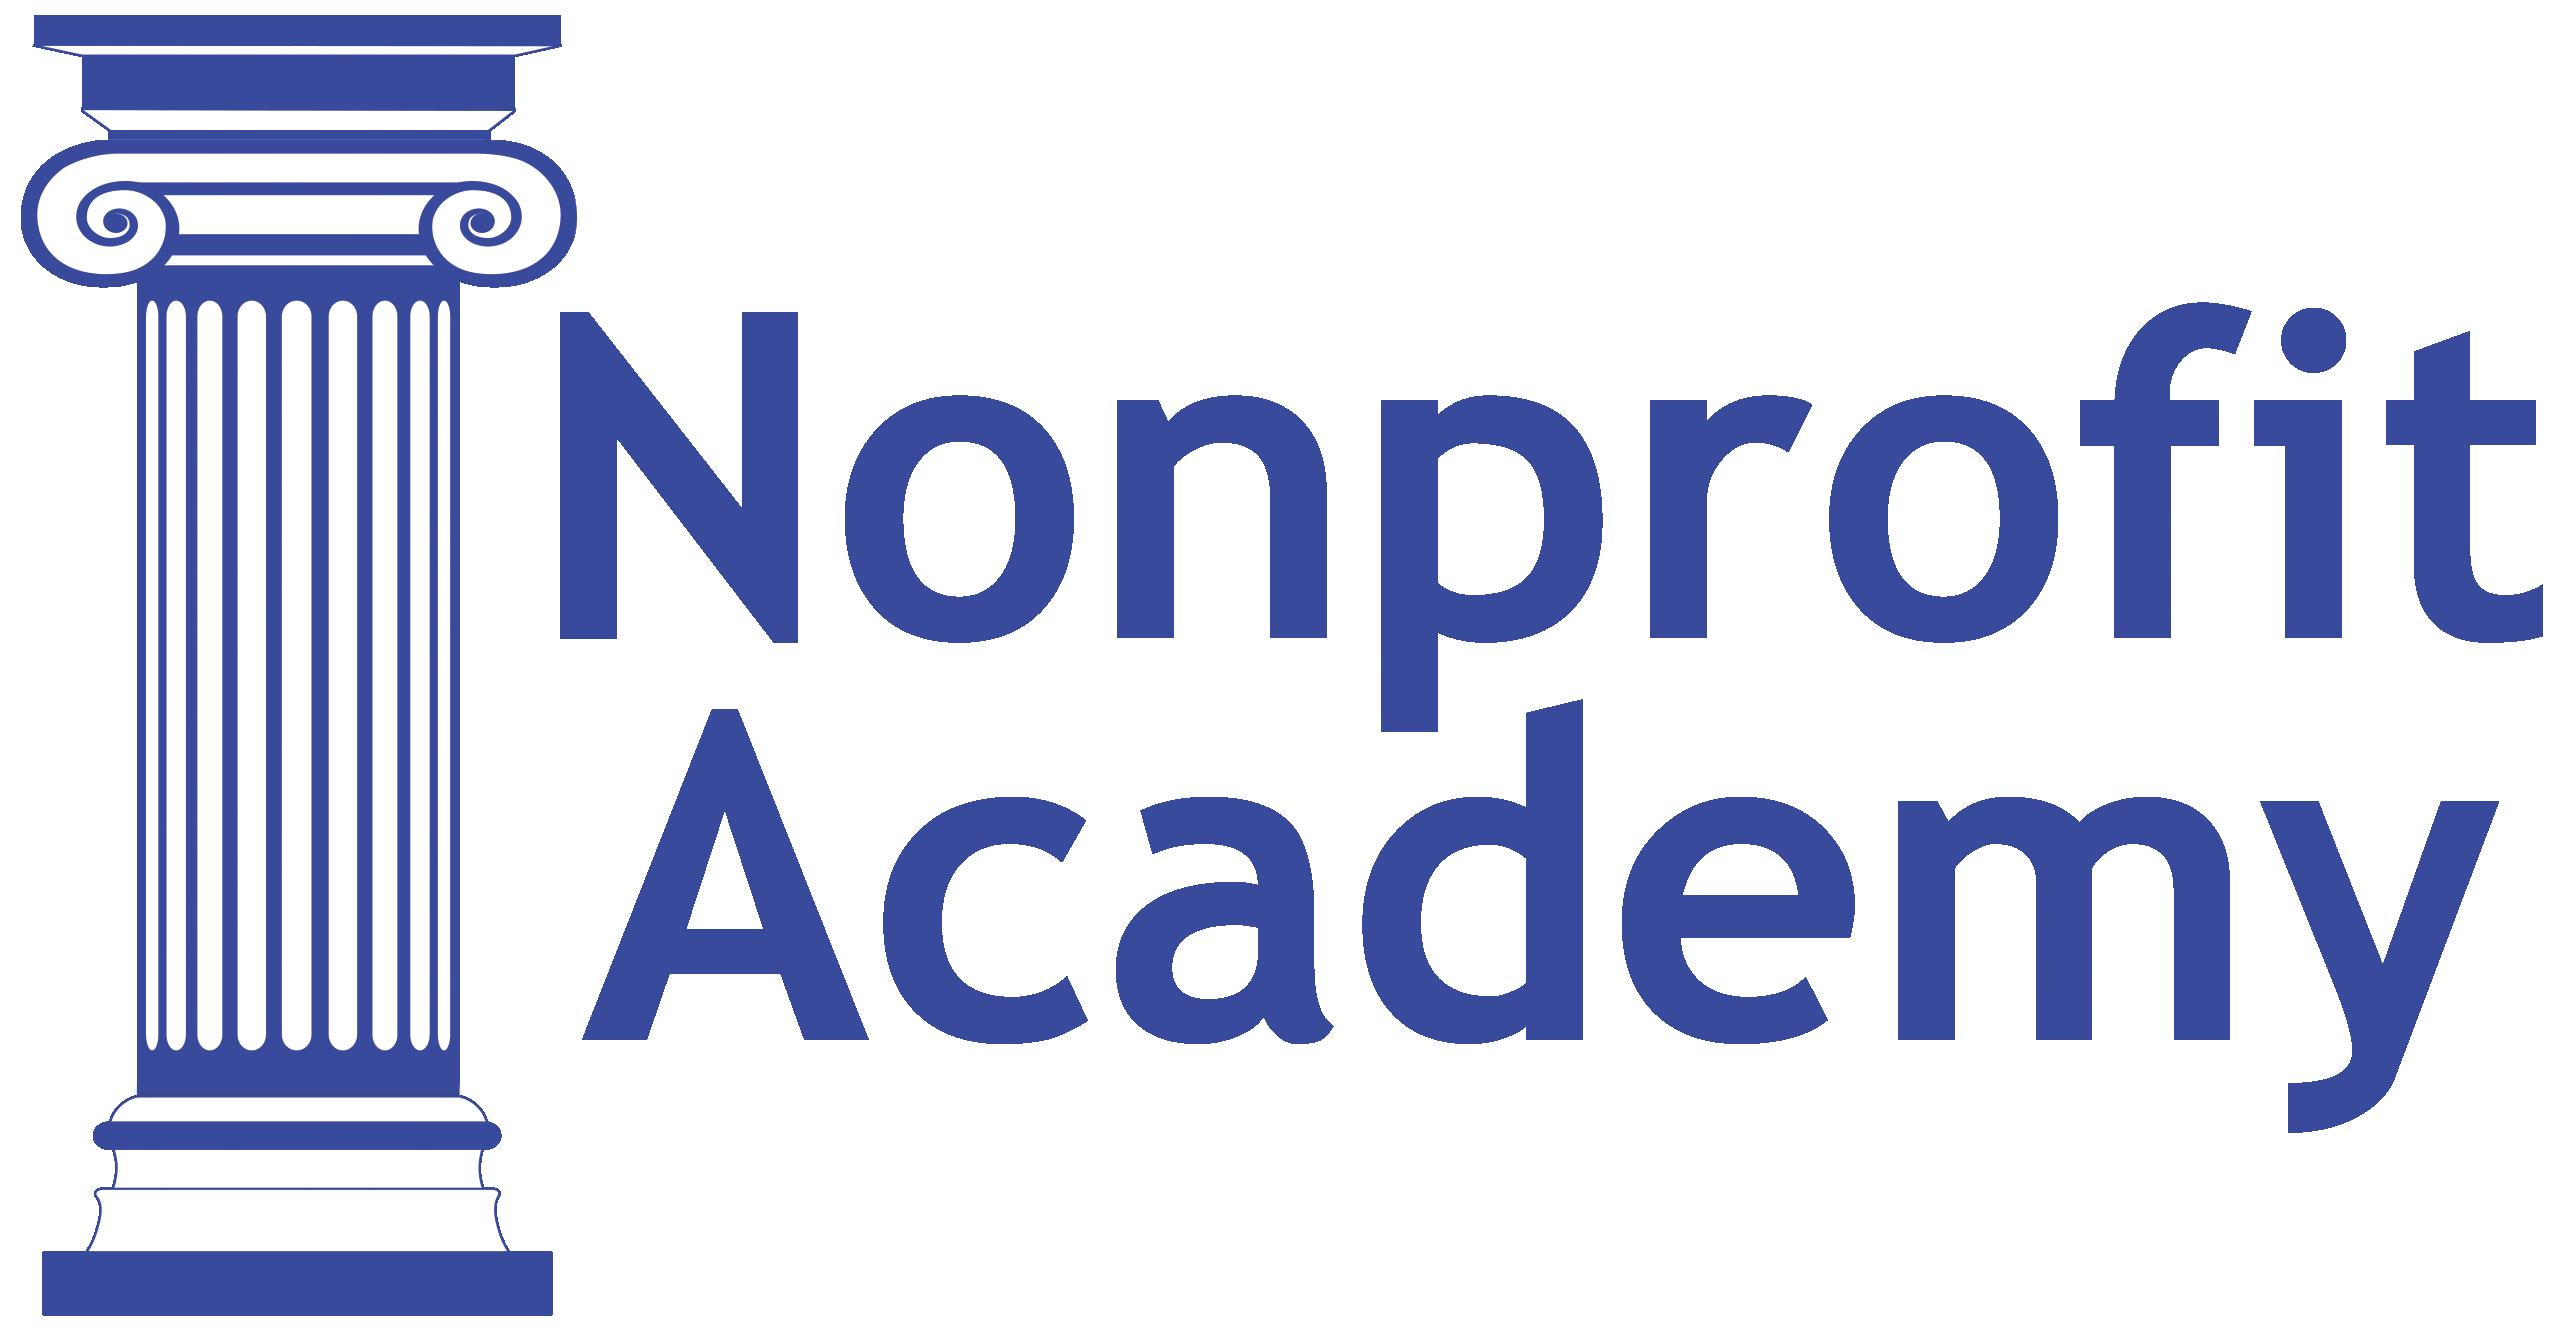 Nonprofit Academy logo